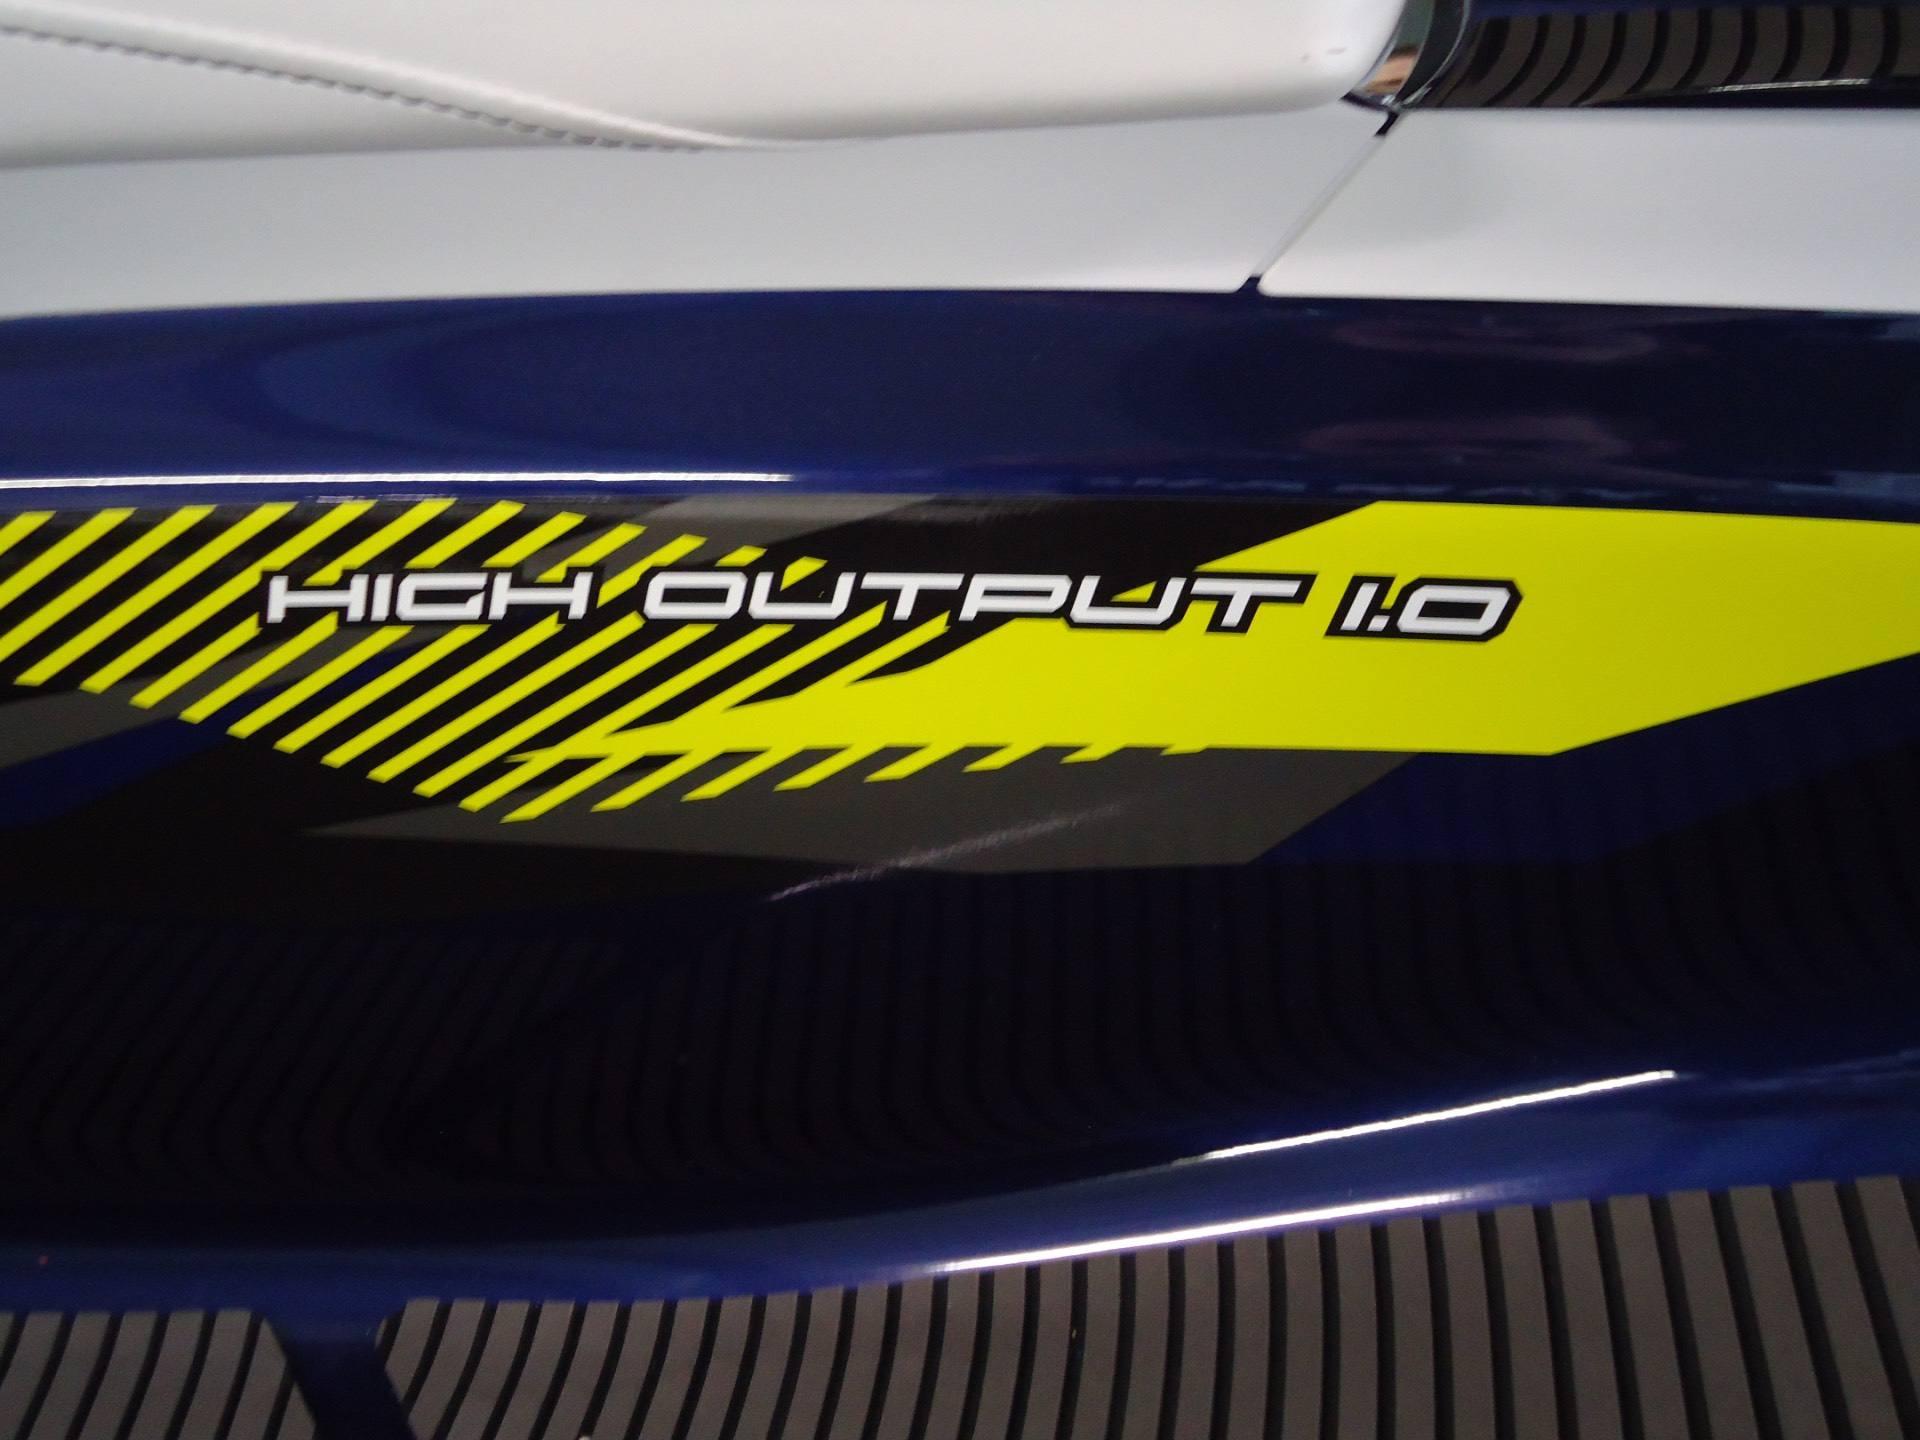 2017 Yamaha VX Deluxe 6